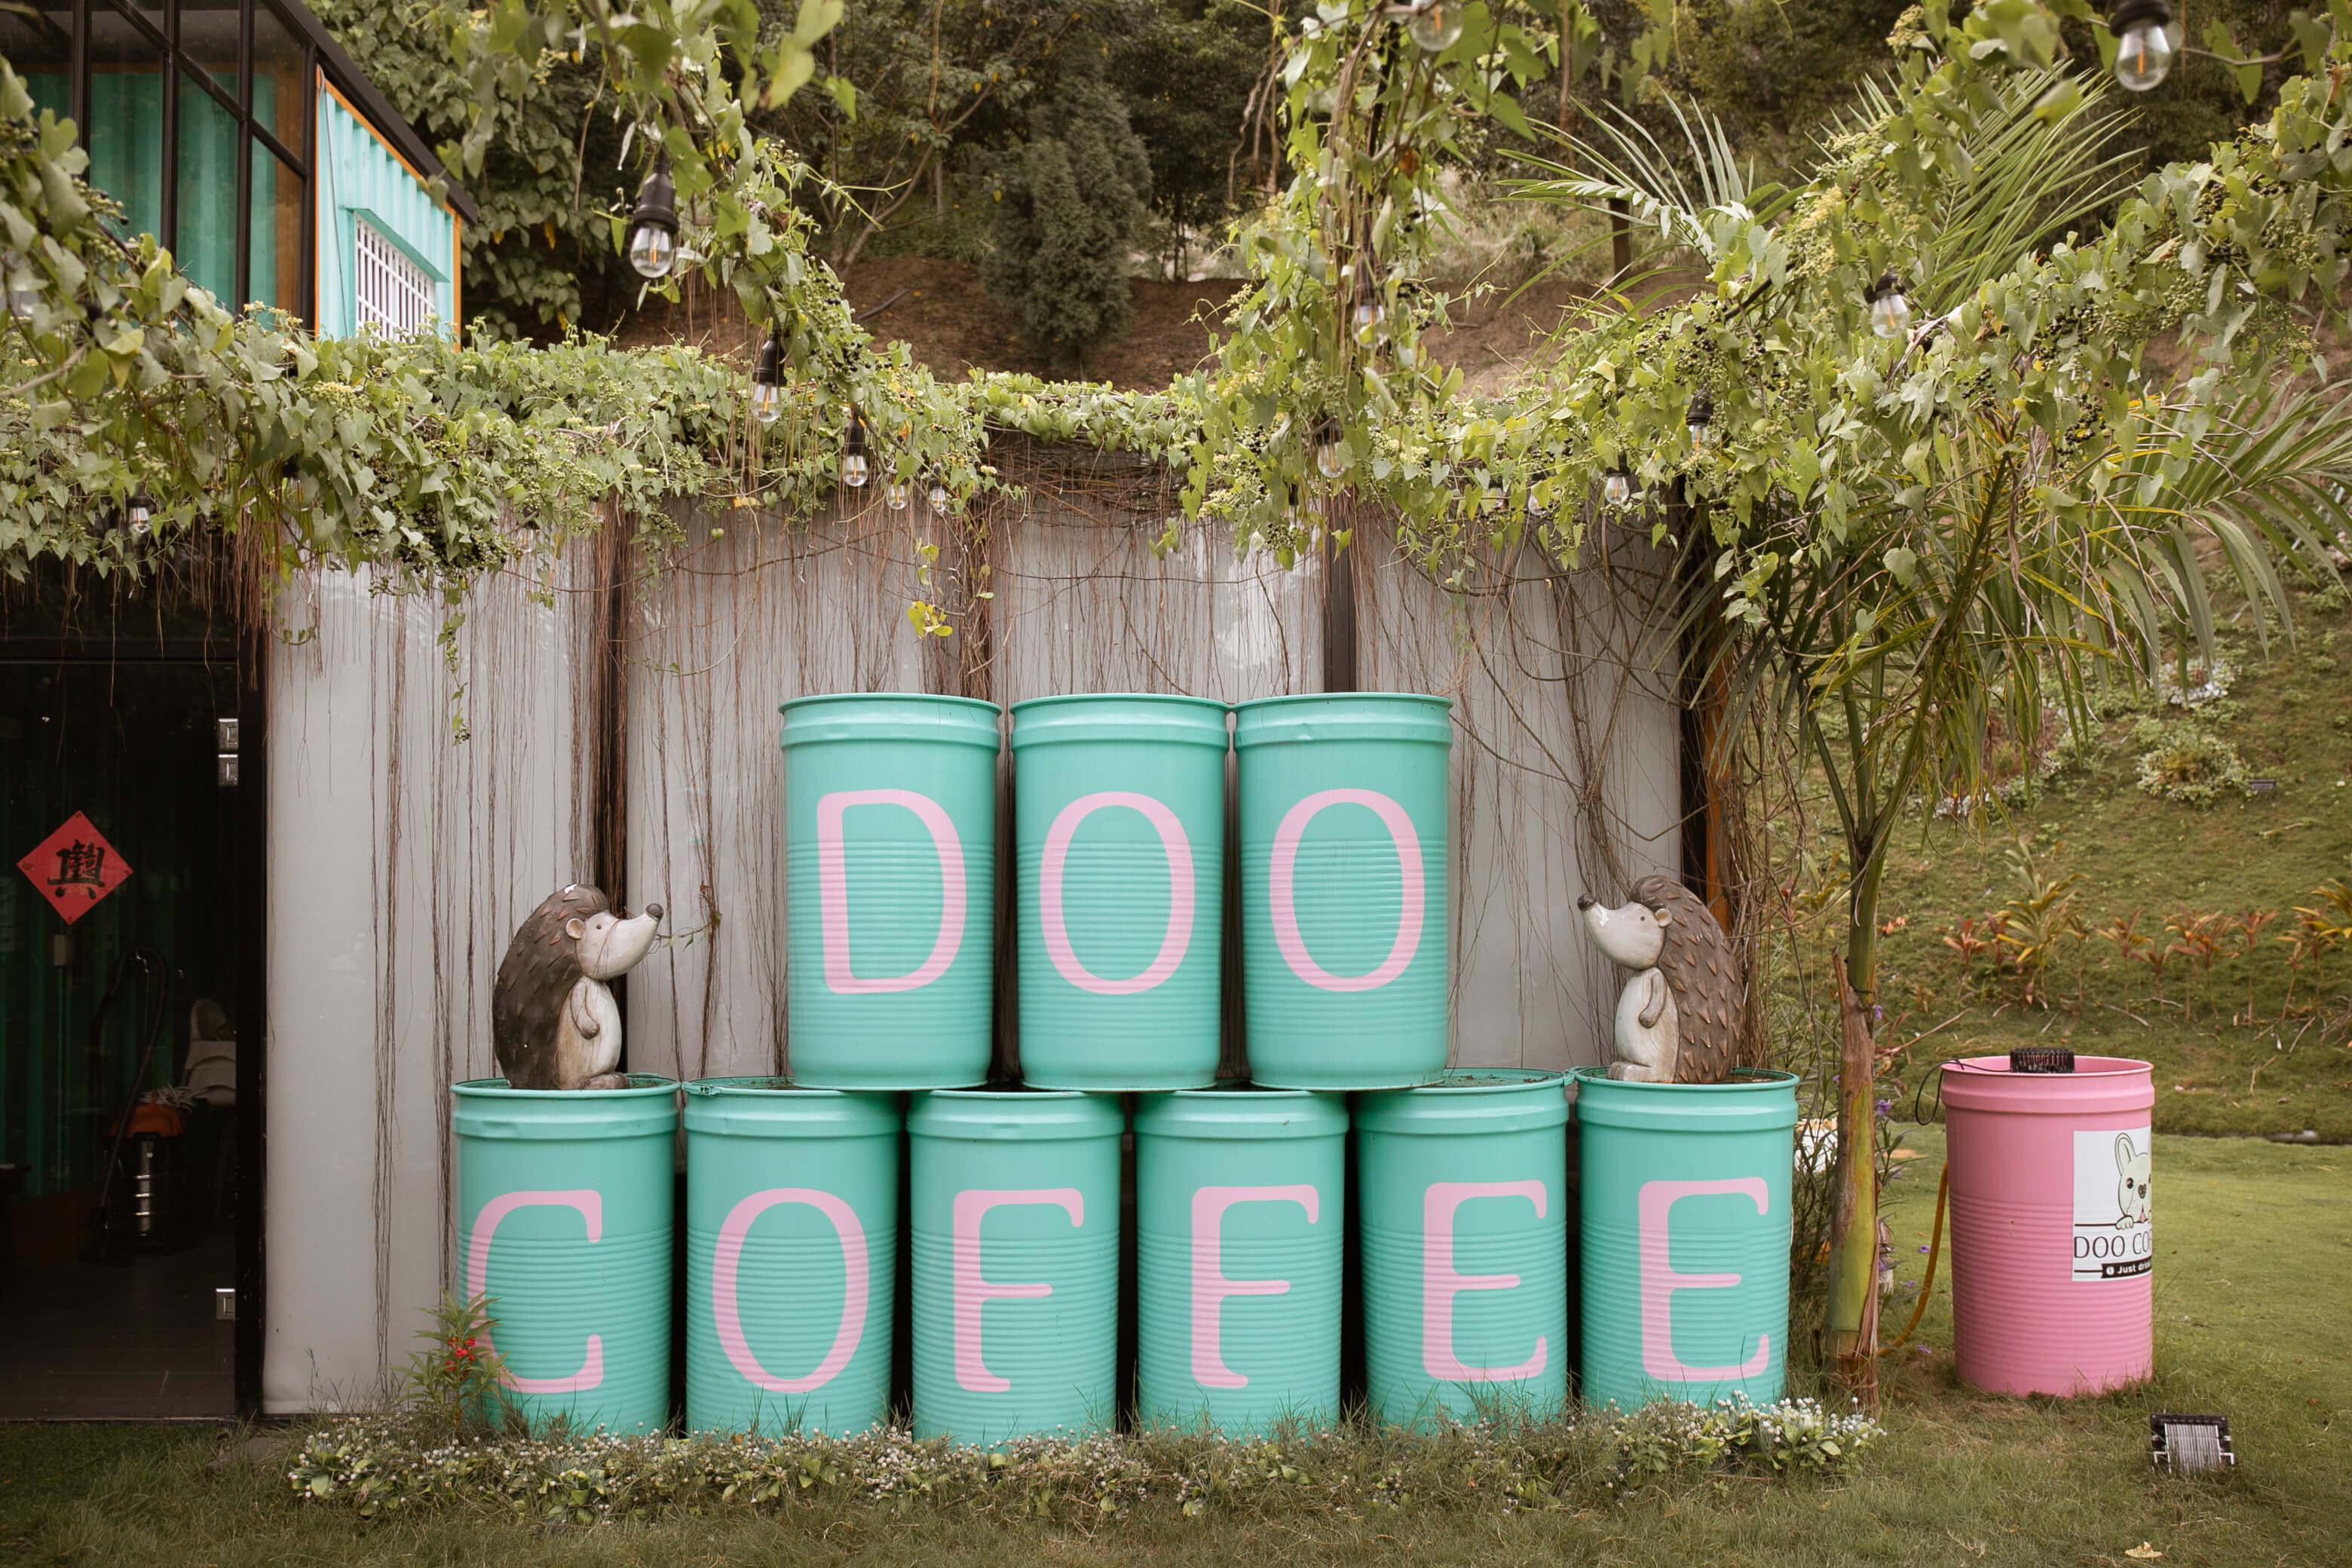 dog coffee_店外門口2